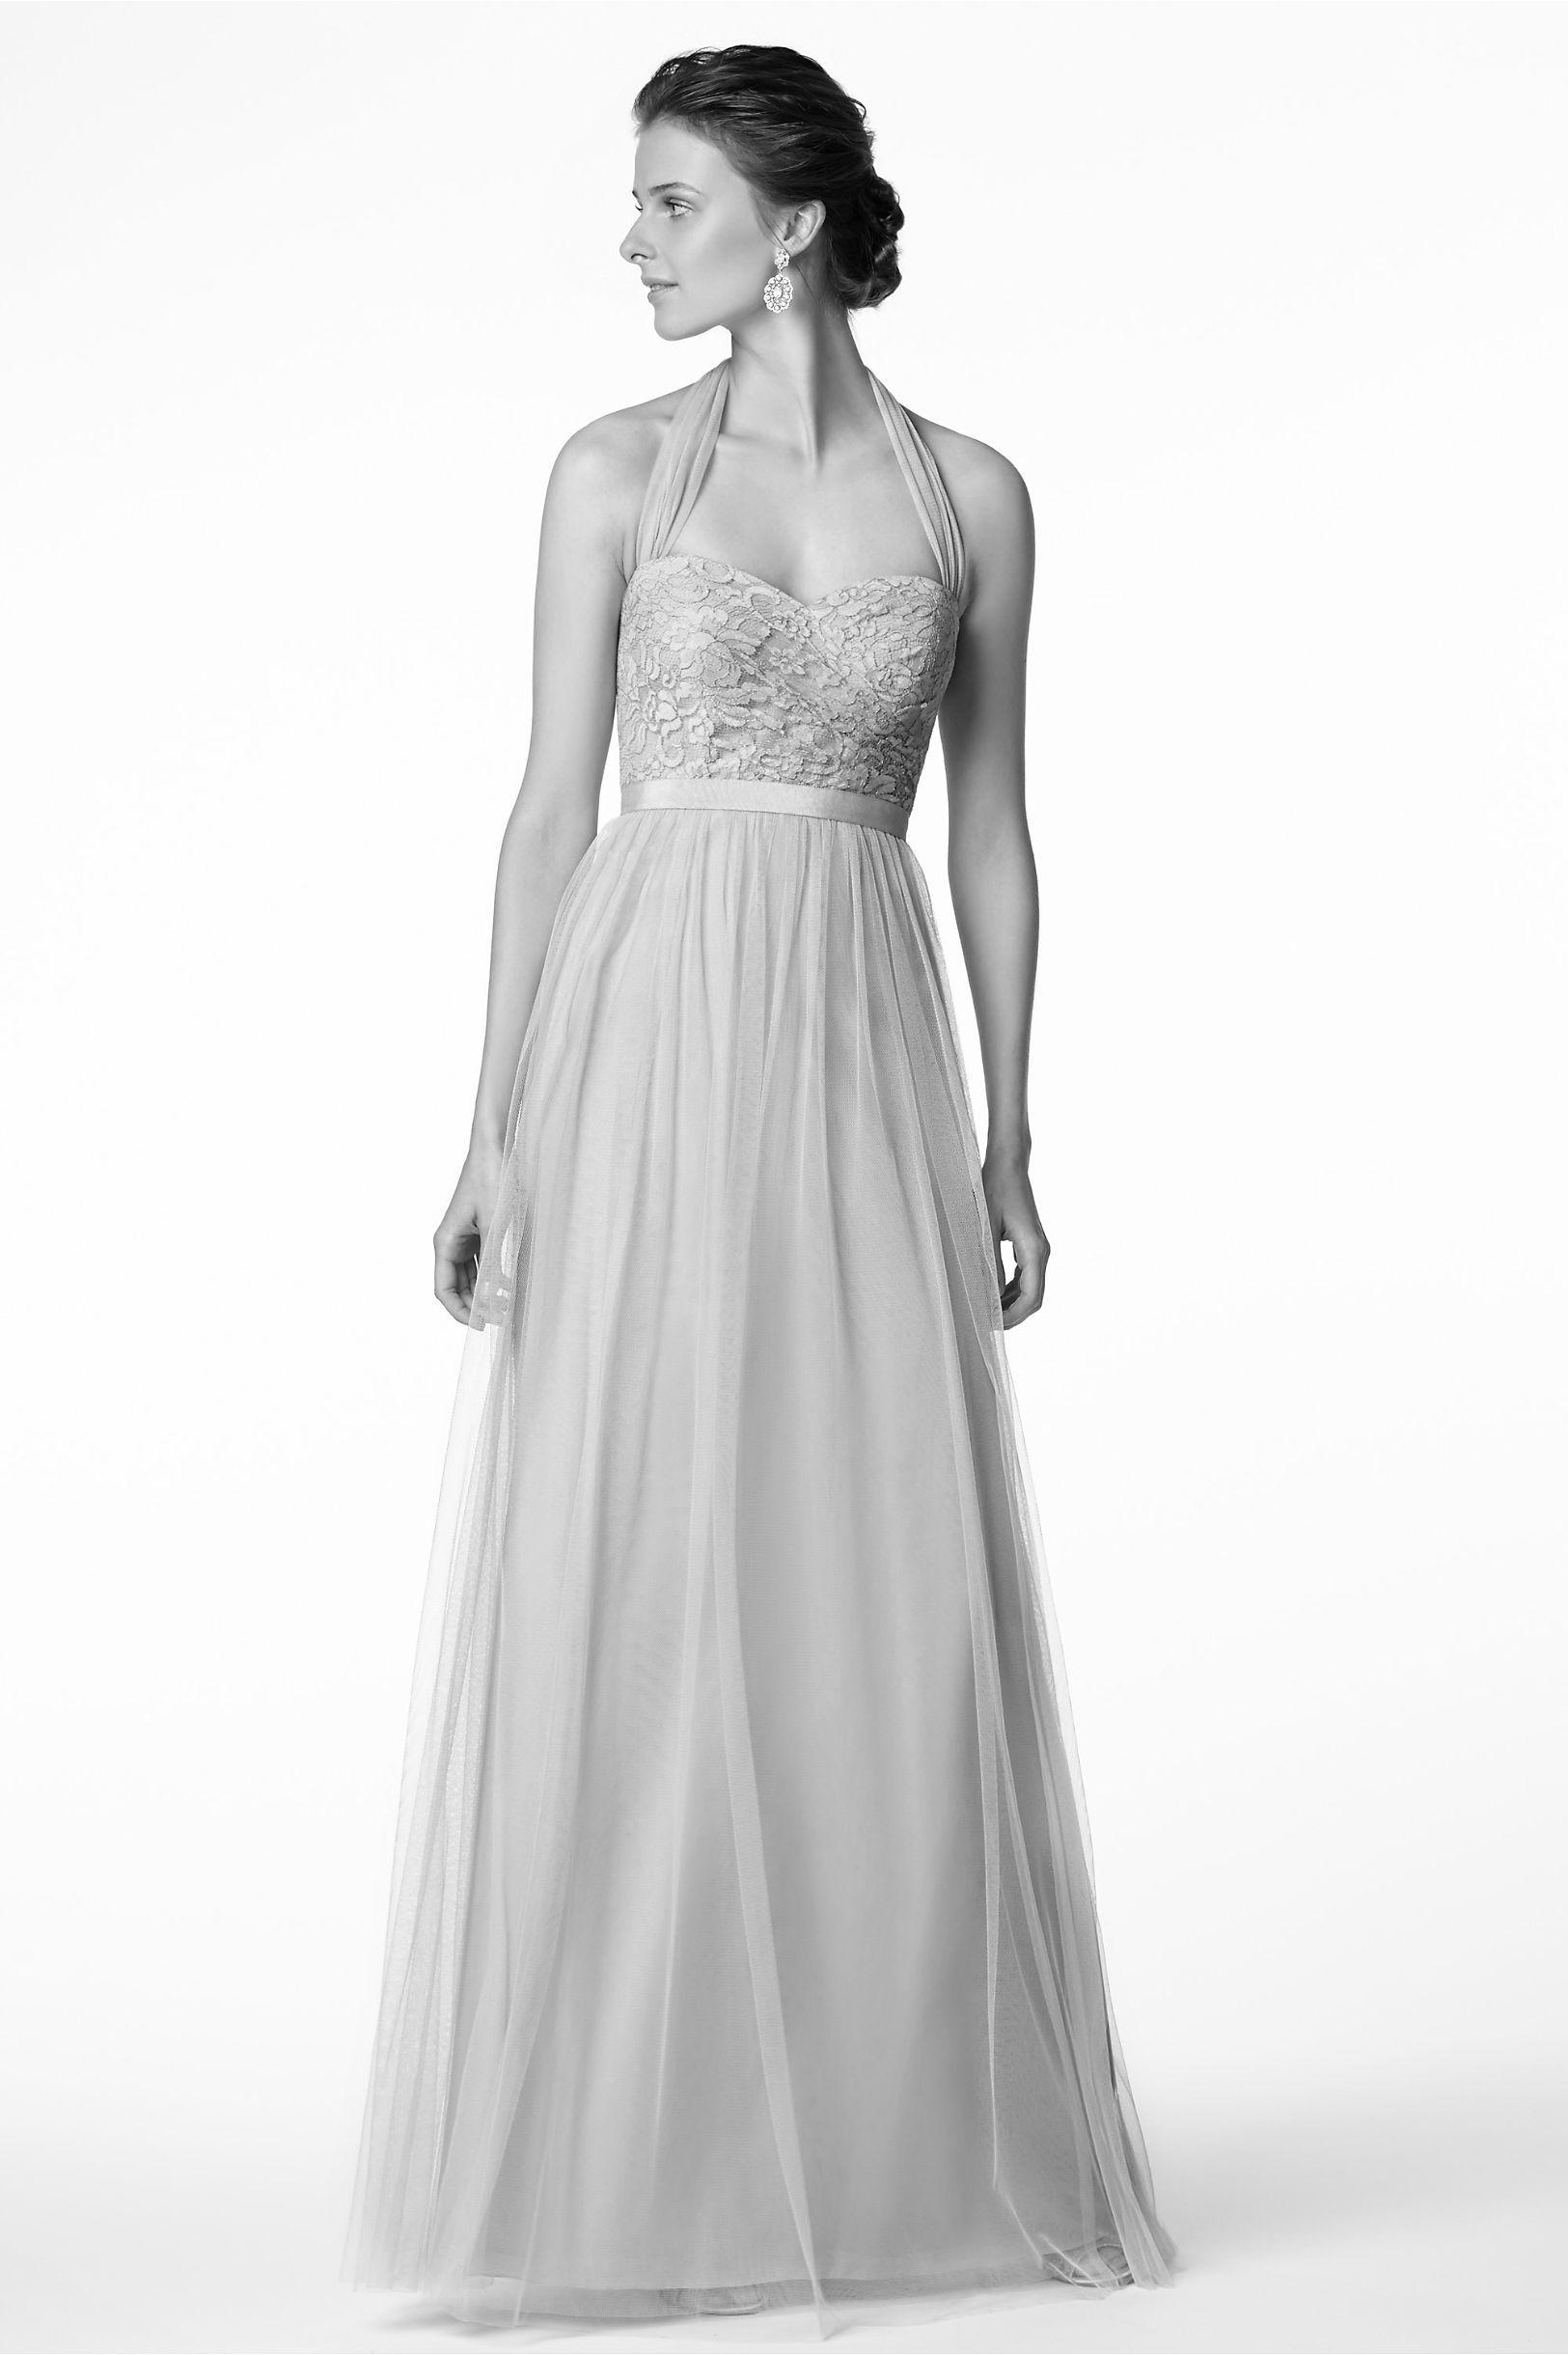 Juliette Dress in Bride Reception Dresses at BHLDN